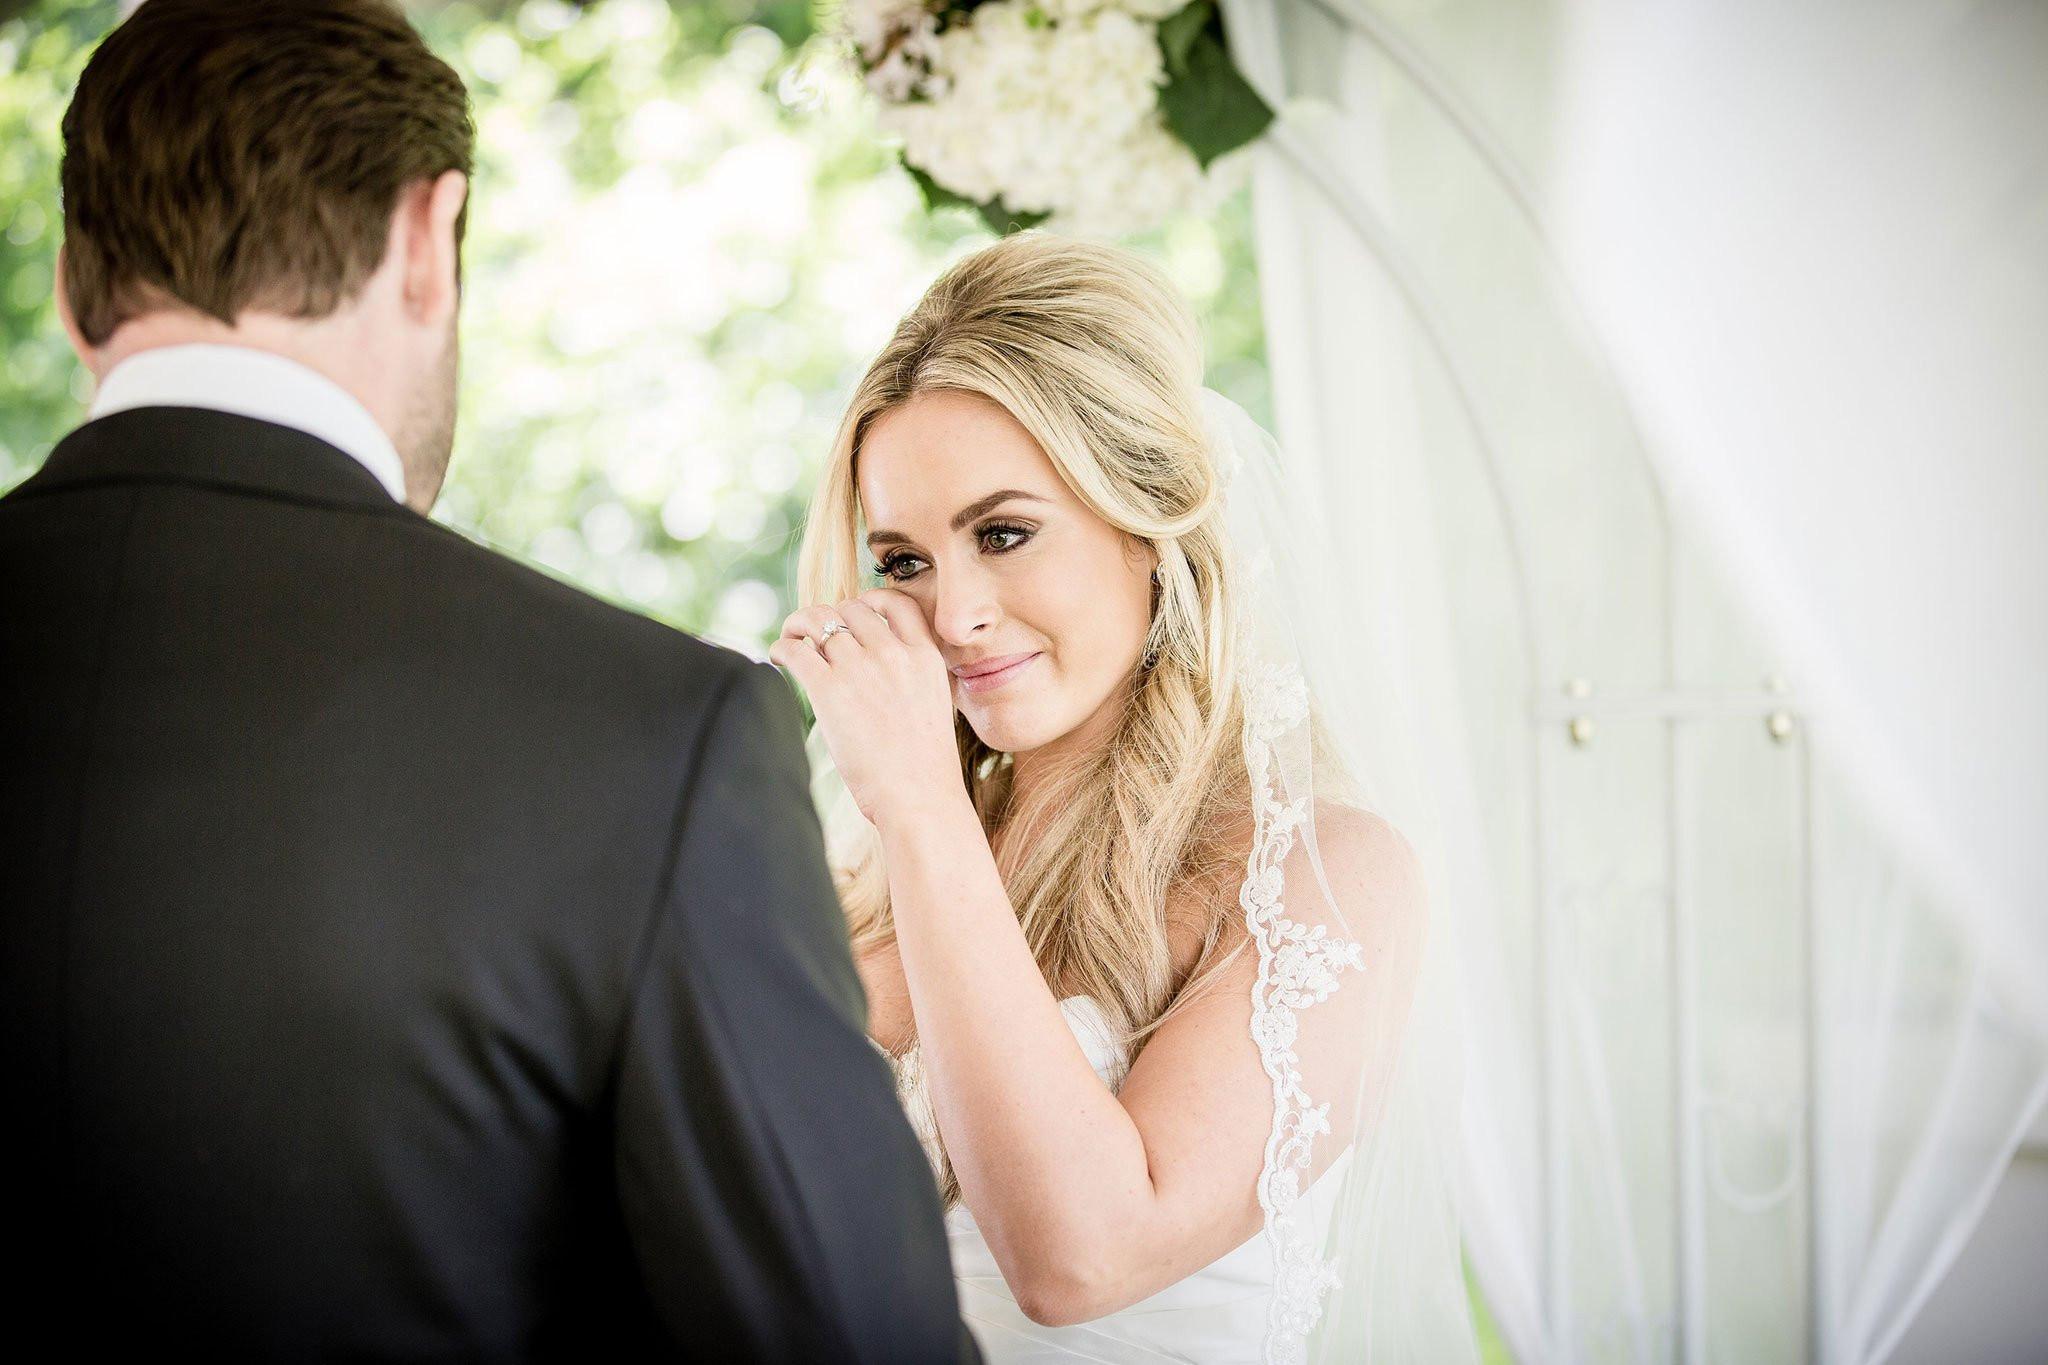 Bruiloft Muziek Ceremonie Theperfectwedding Nl